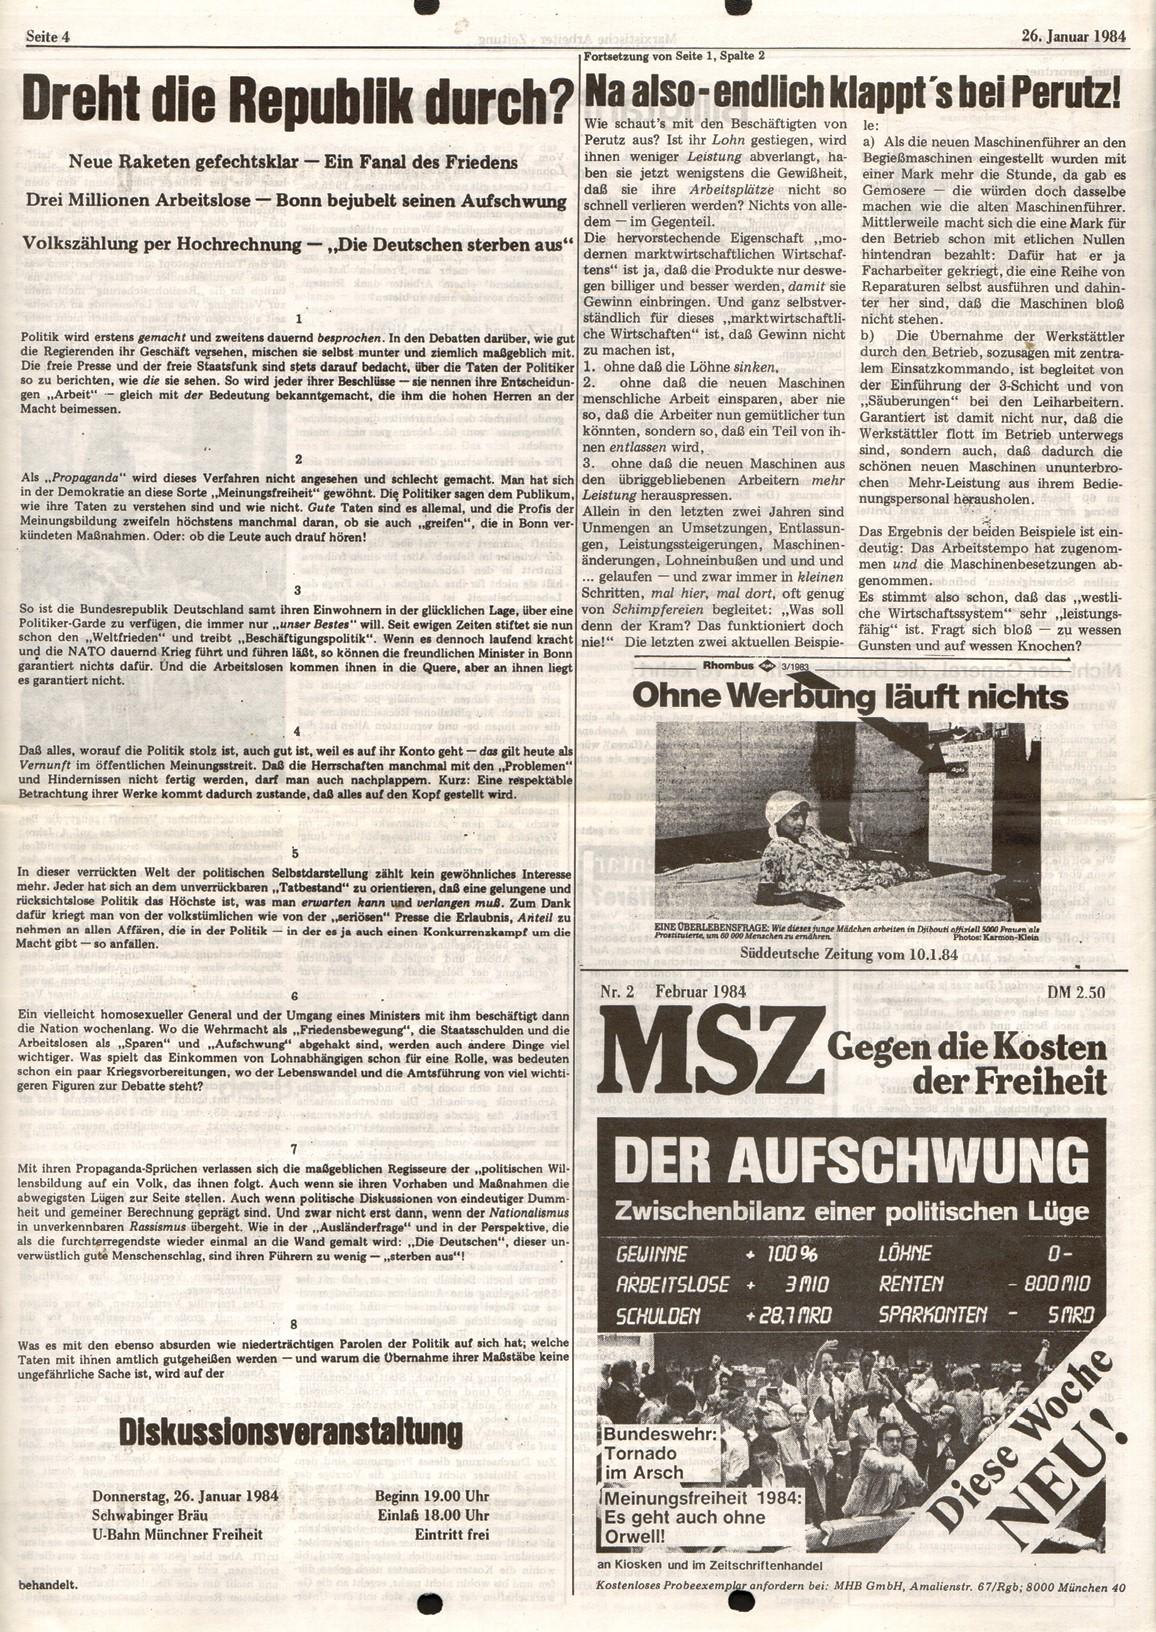 Muenchen_MG_MAZ_AGFA_19840126_04